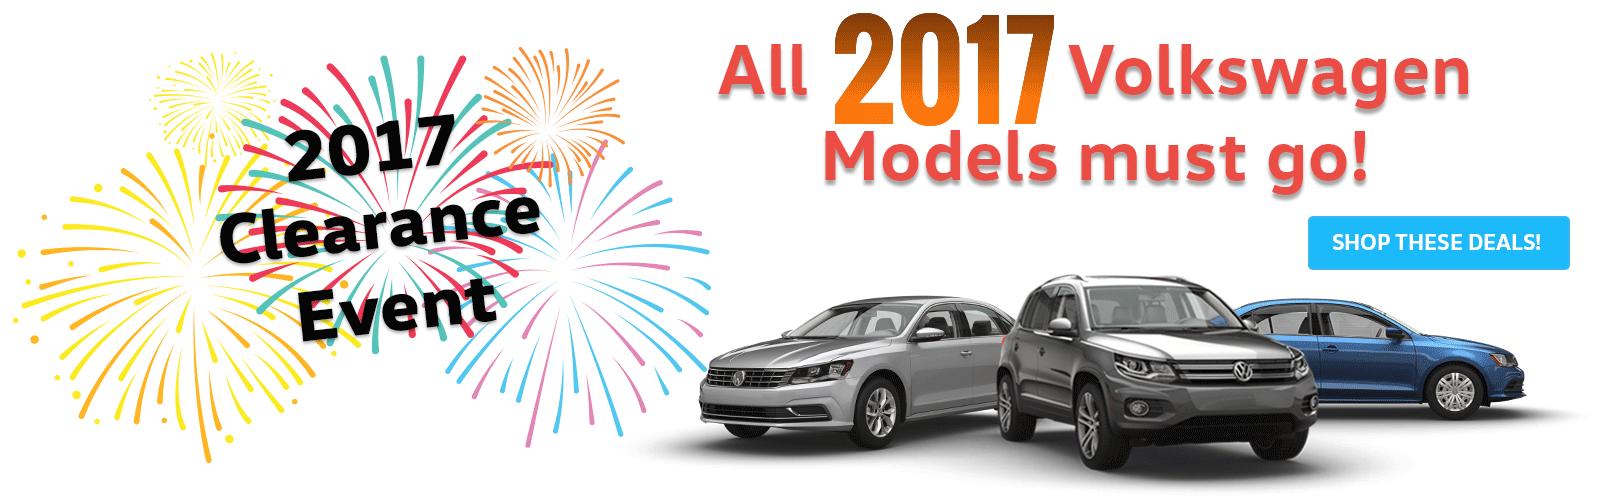 Mike Raisor Volkswagen New Volkswagen and Used Car Dealer ...